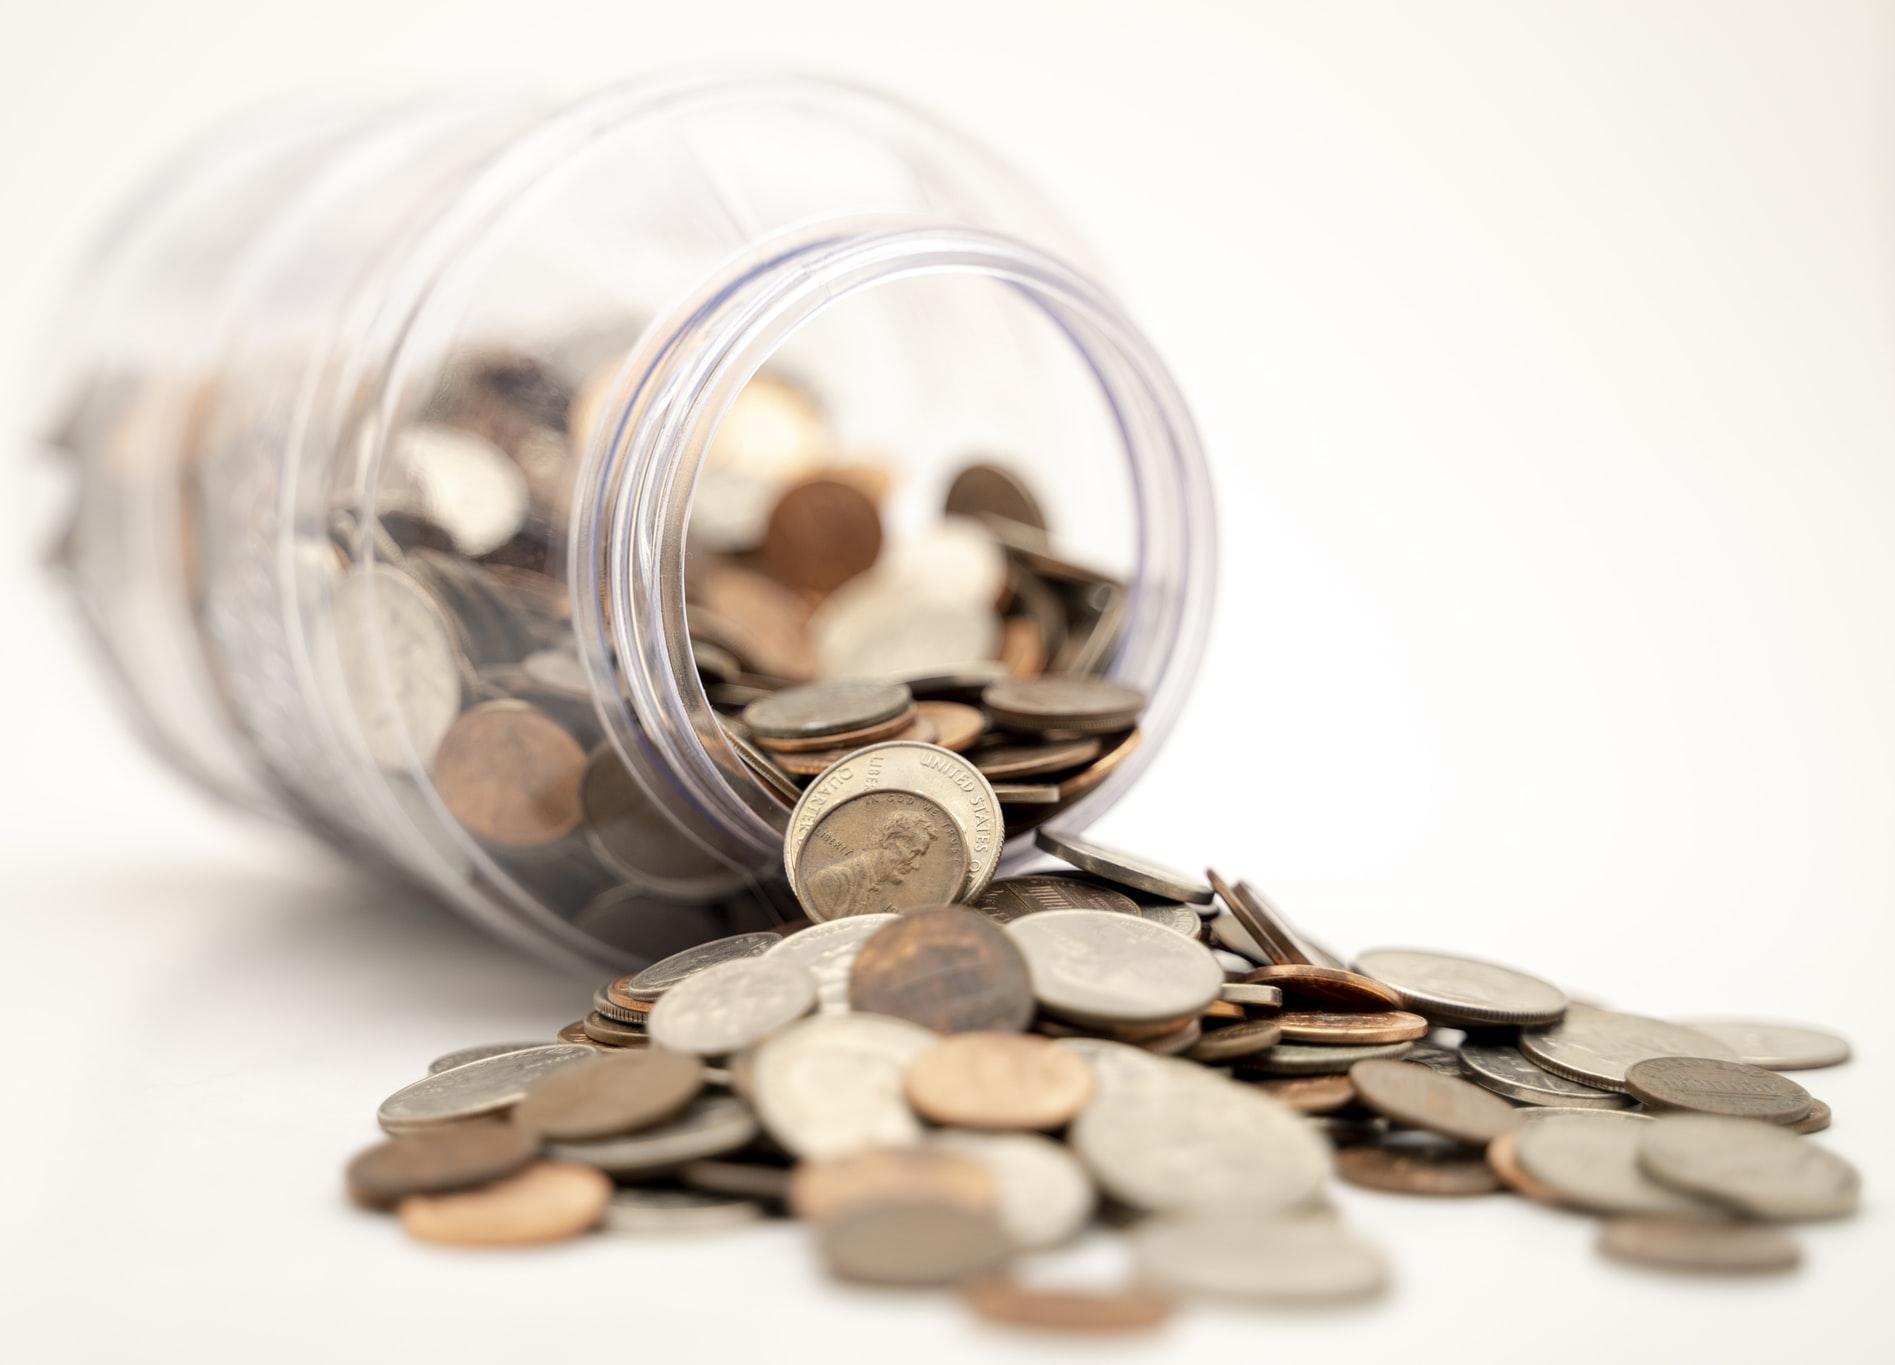 spilled coins